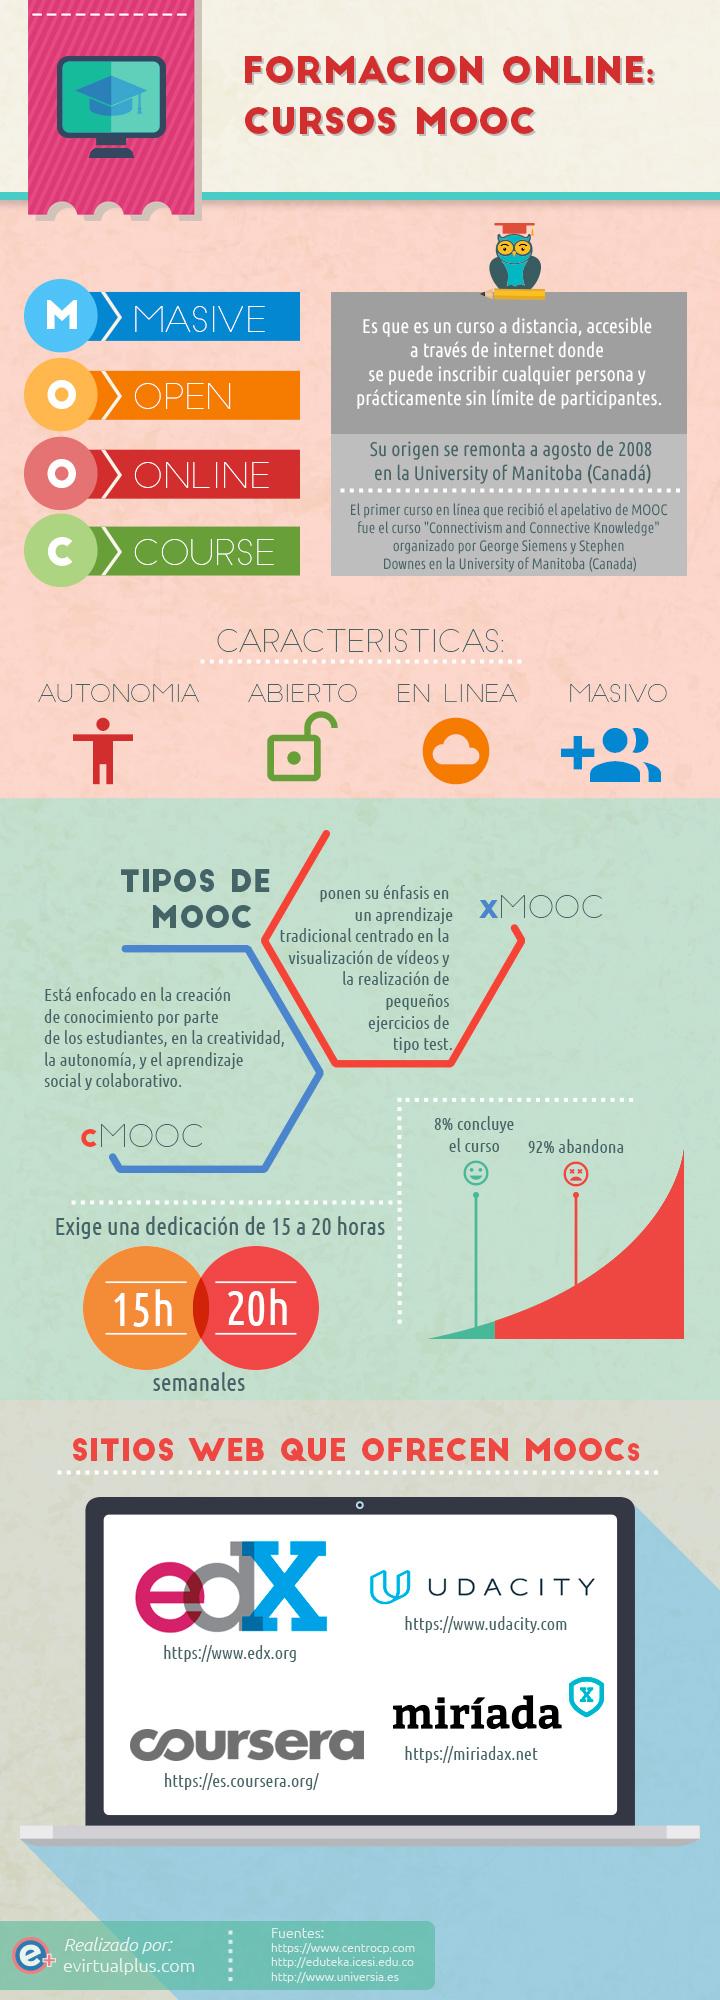 Formaci n online cursos mooc infografia infographic for Curso de interiorismo a distancia